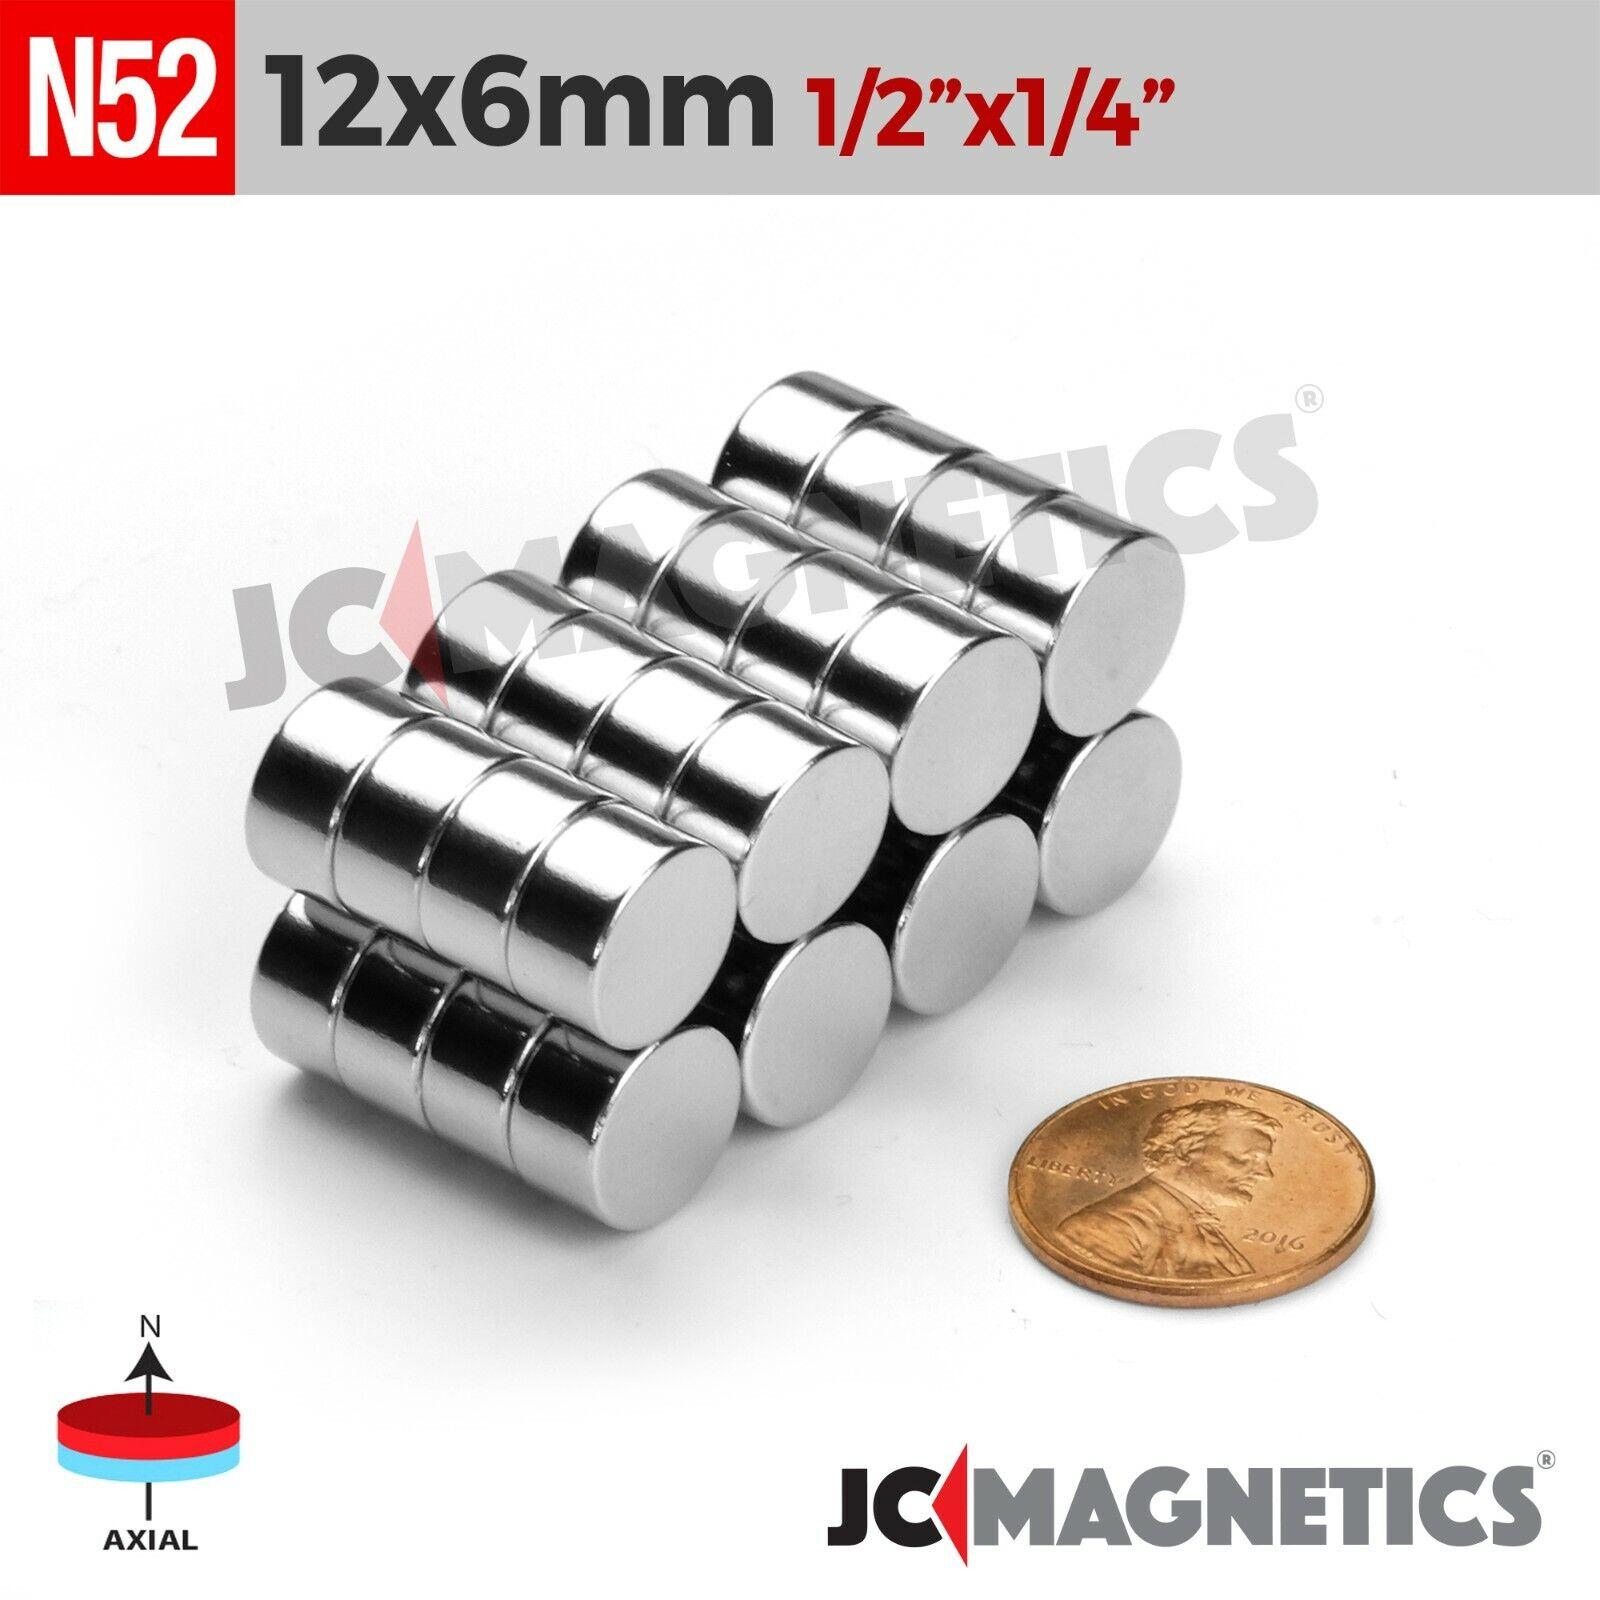 "5 10 25pc 12mm x 6mm 1/2"" x 1/4"" N52 Strong Rare Earth Neody"